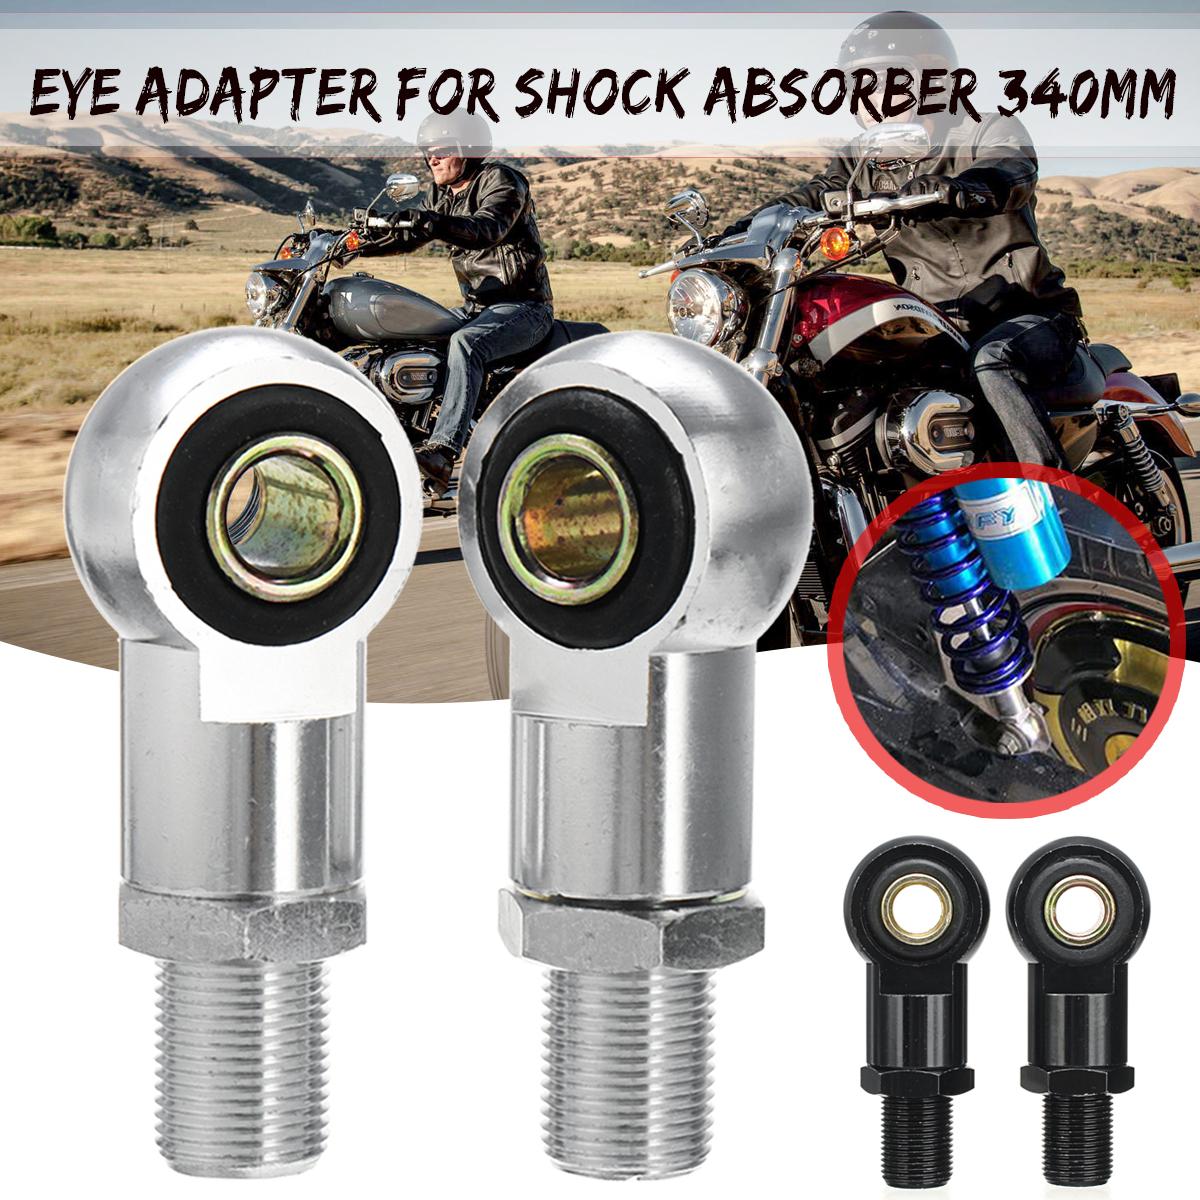 Noir C-FUNN 10Mm Eye Adaptateur Eye End pour Amortisseur 340Mm Moto Scooter ATV